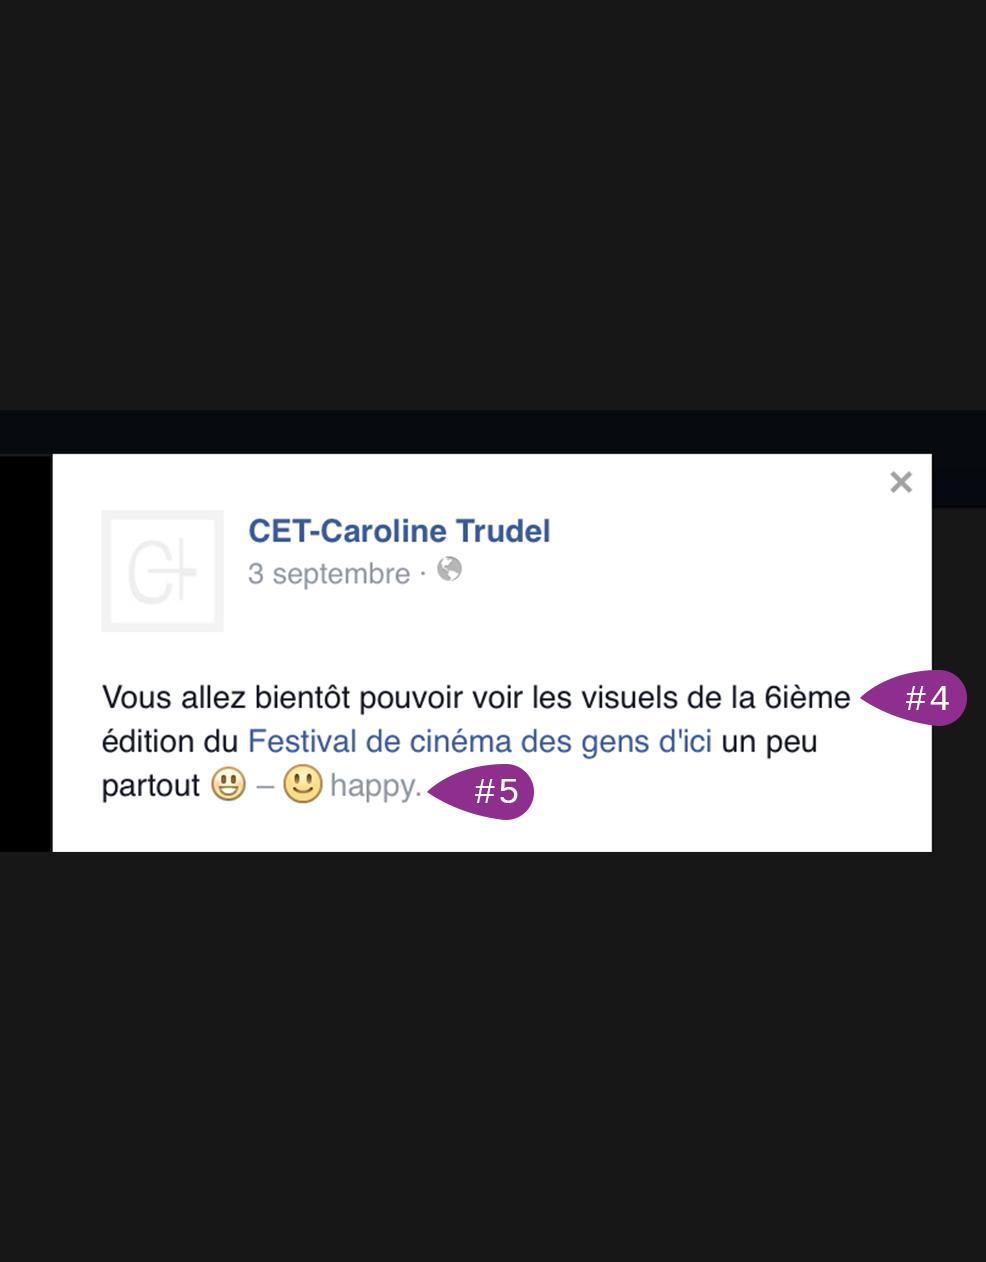 CET - Caroline Trudel Publication